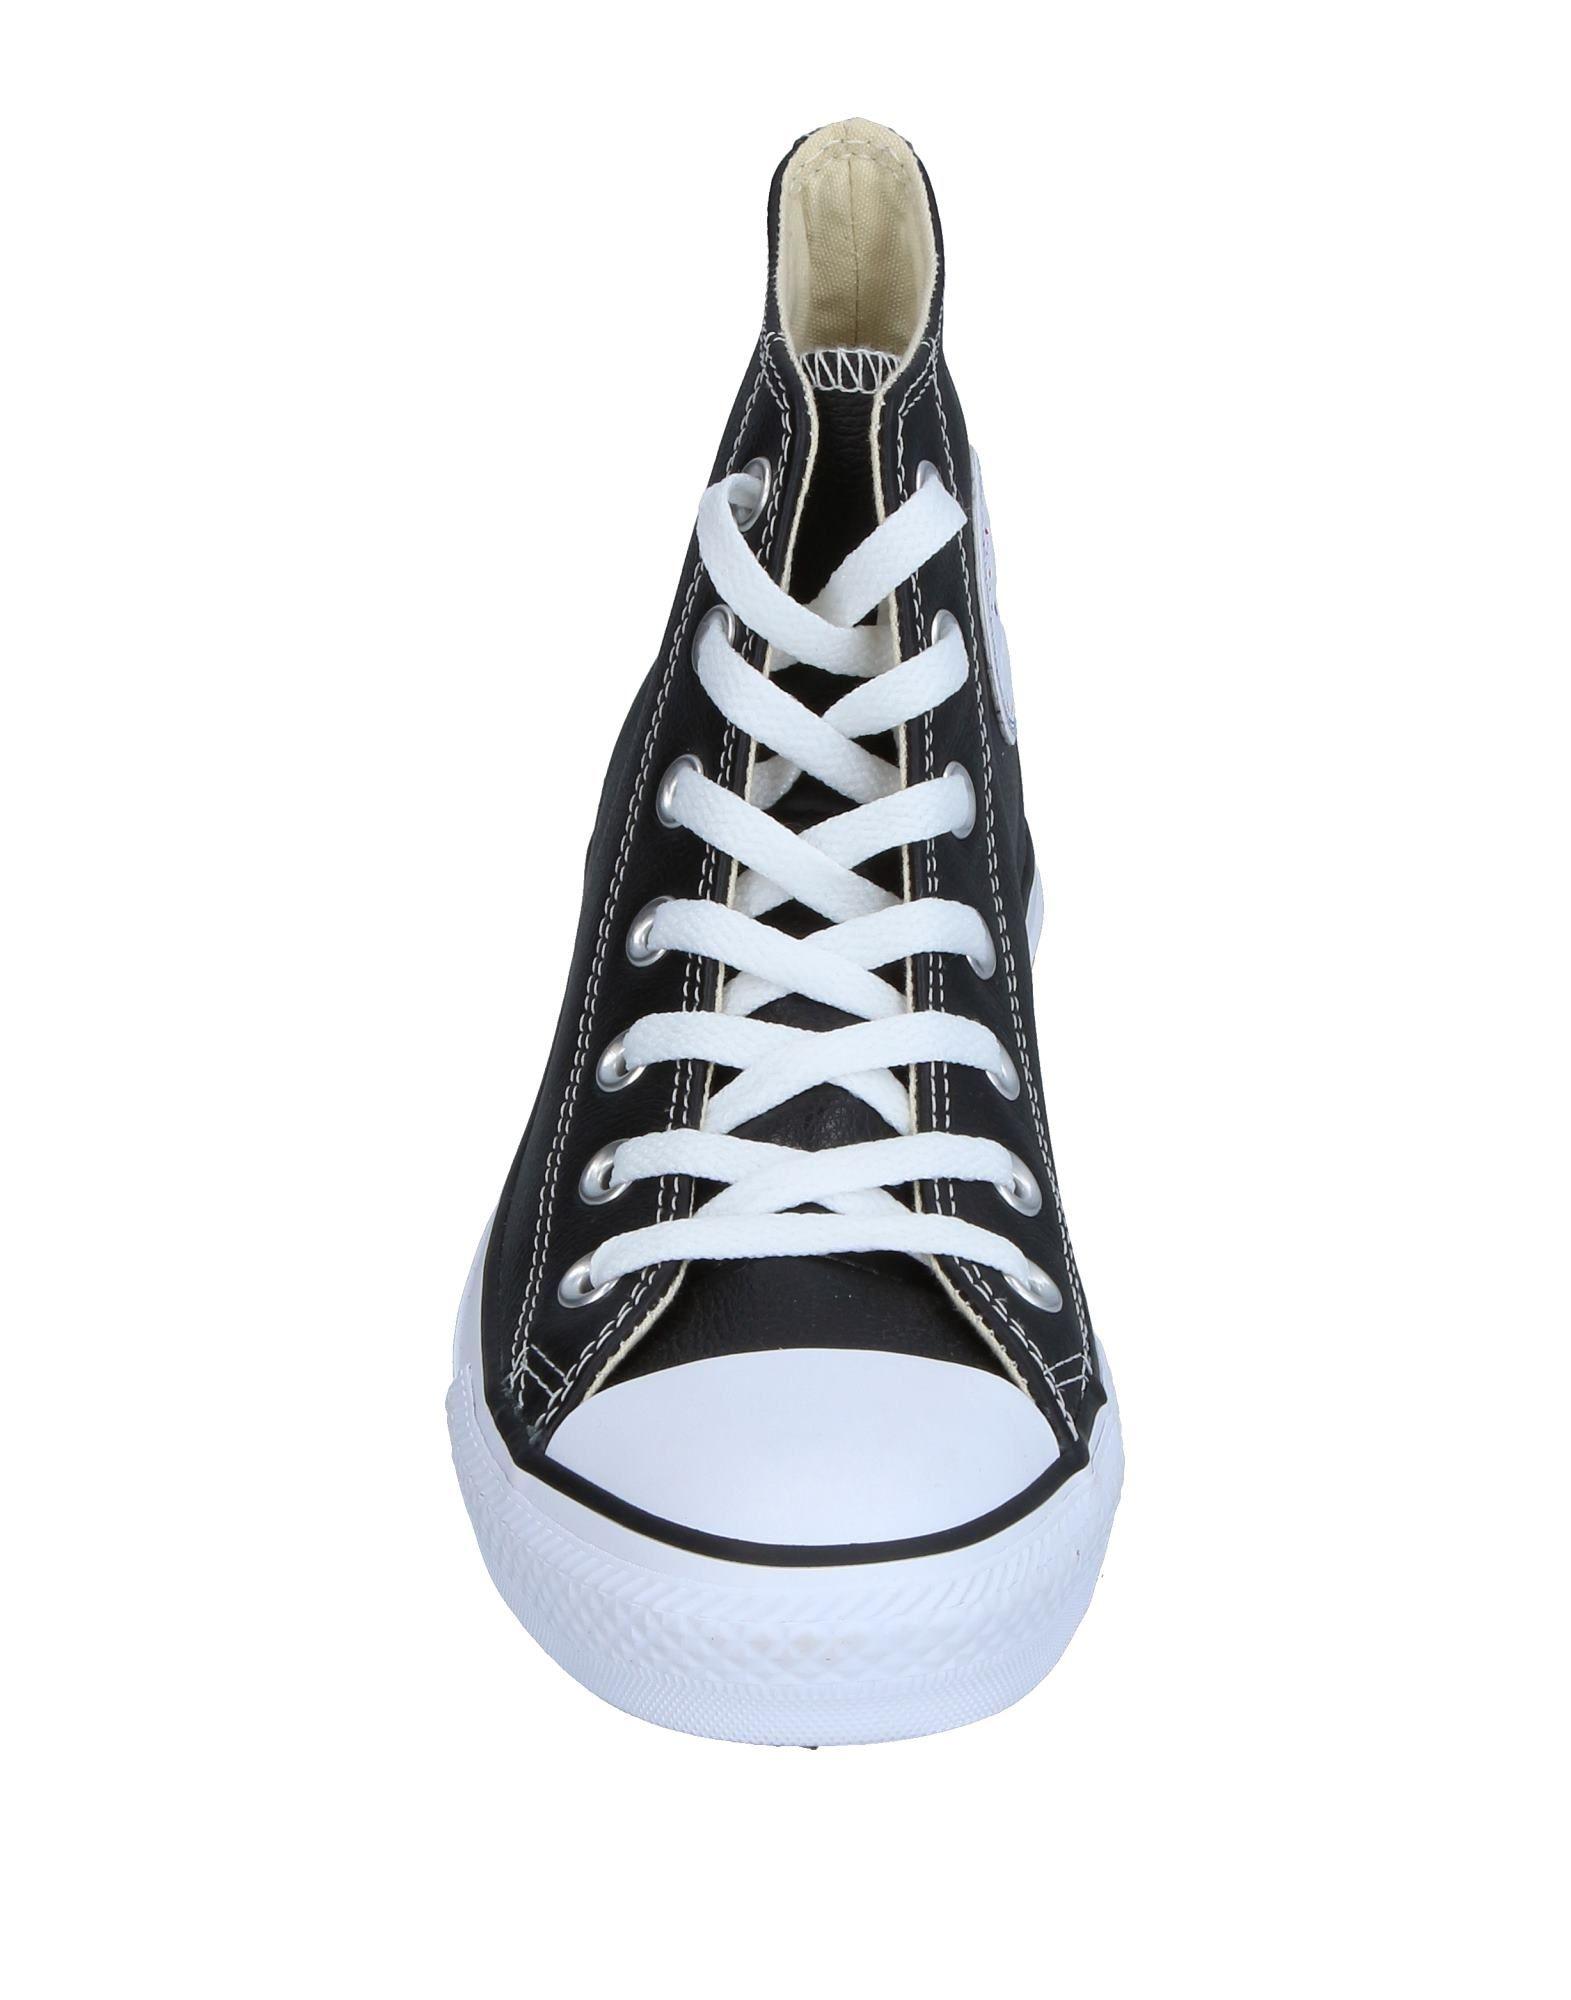 Converse All Star Qualität Sneakers Damen  11281199JJ Gute Qualität Star beliebte Schuhe 3f75c0